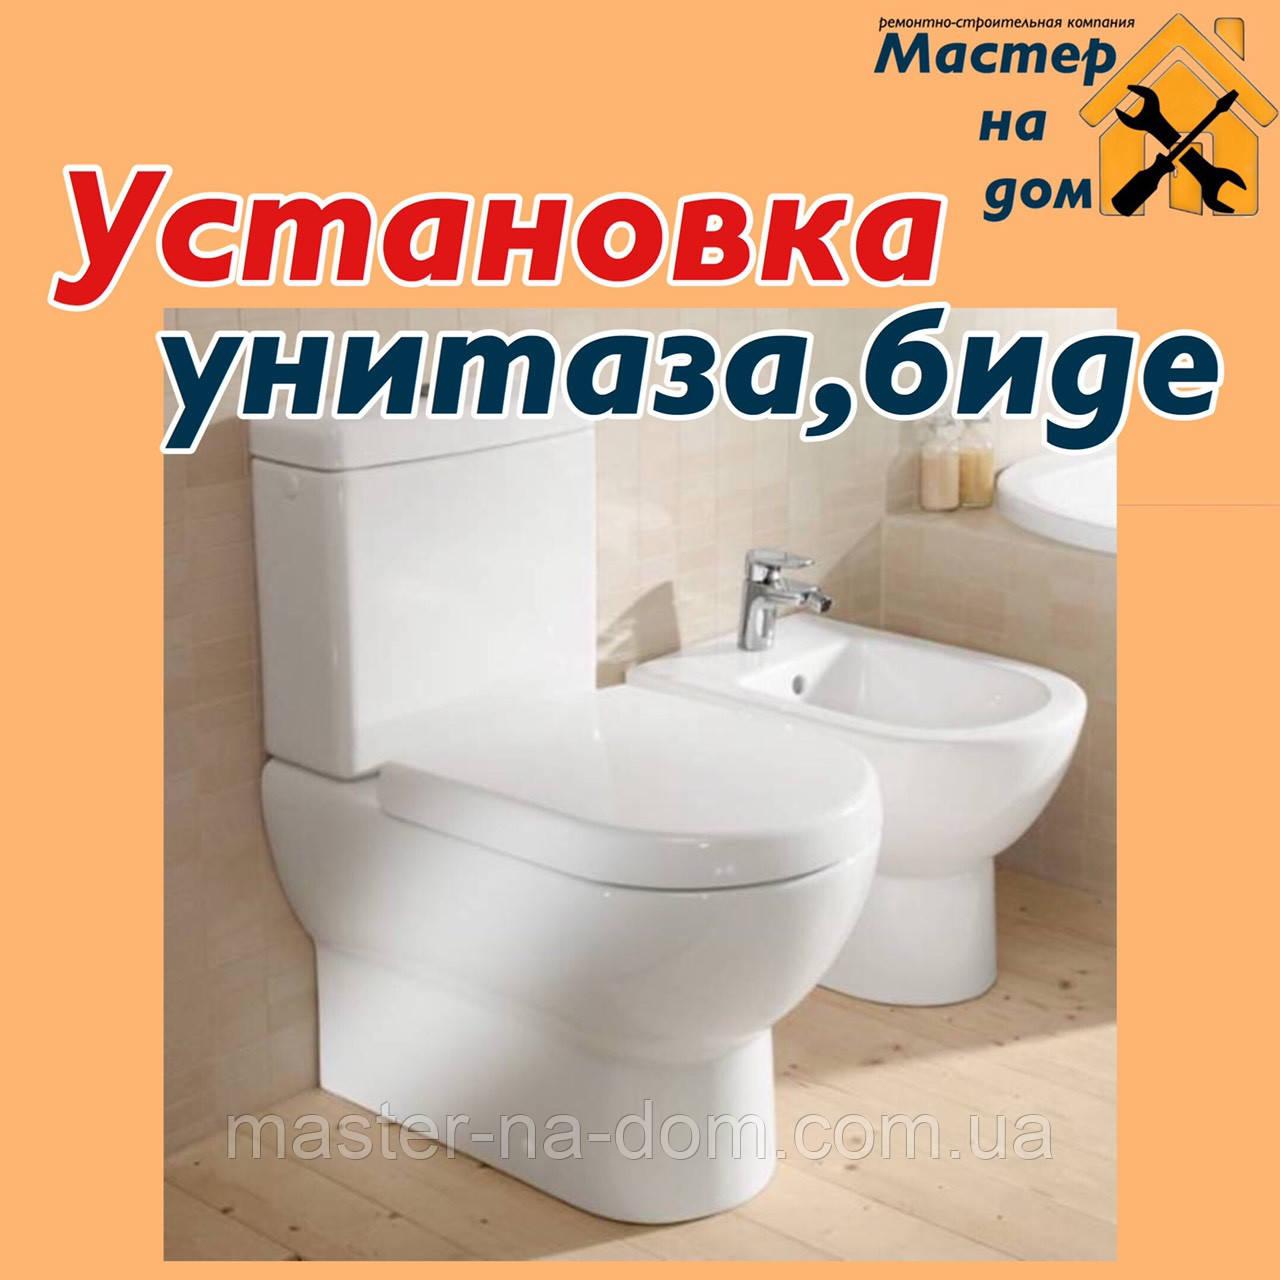 Монтаж унитаза и биде в Черновцах, фото 1